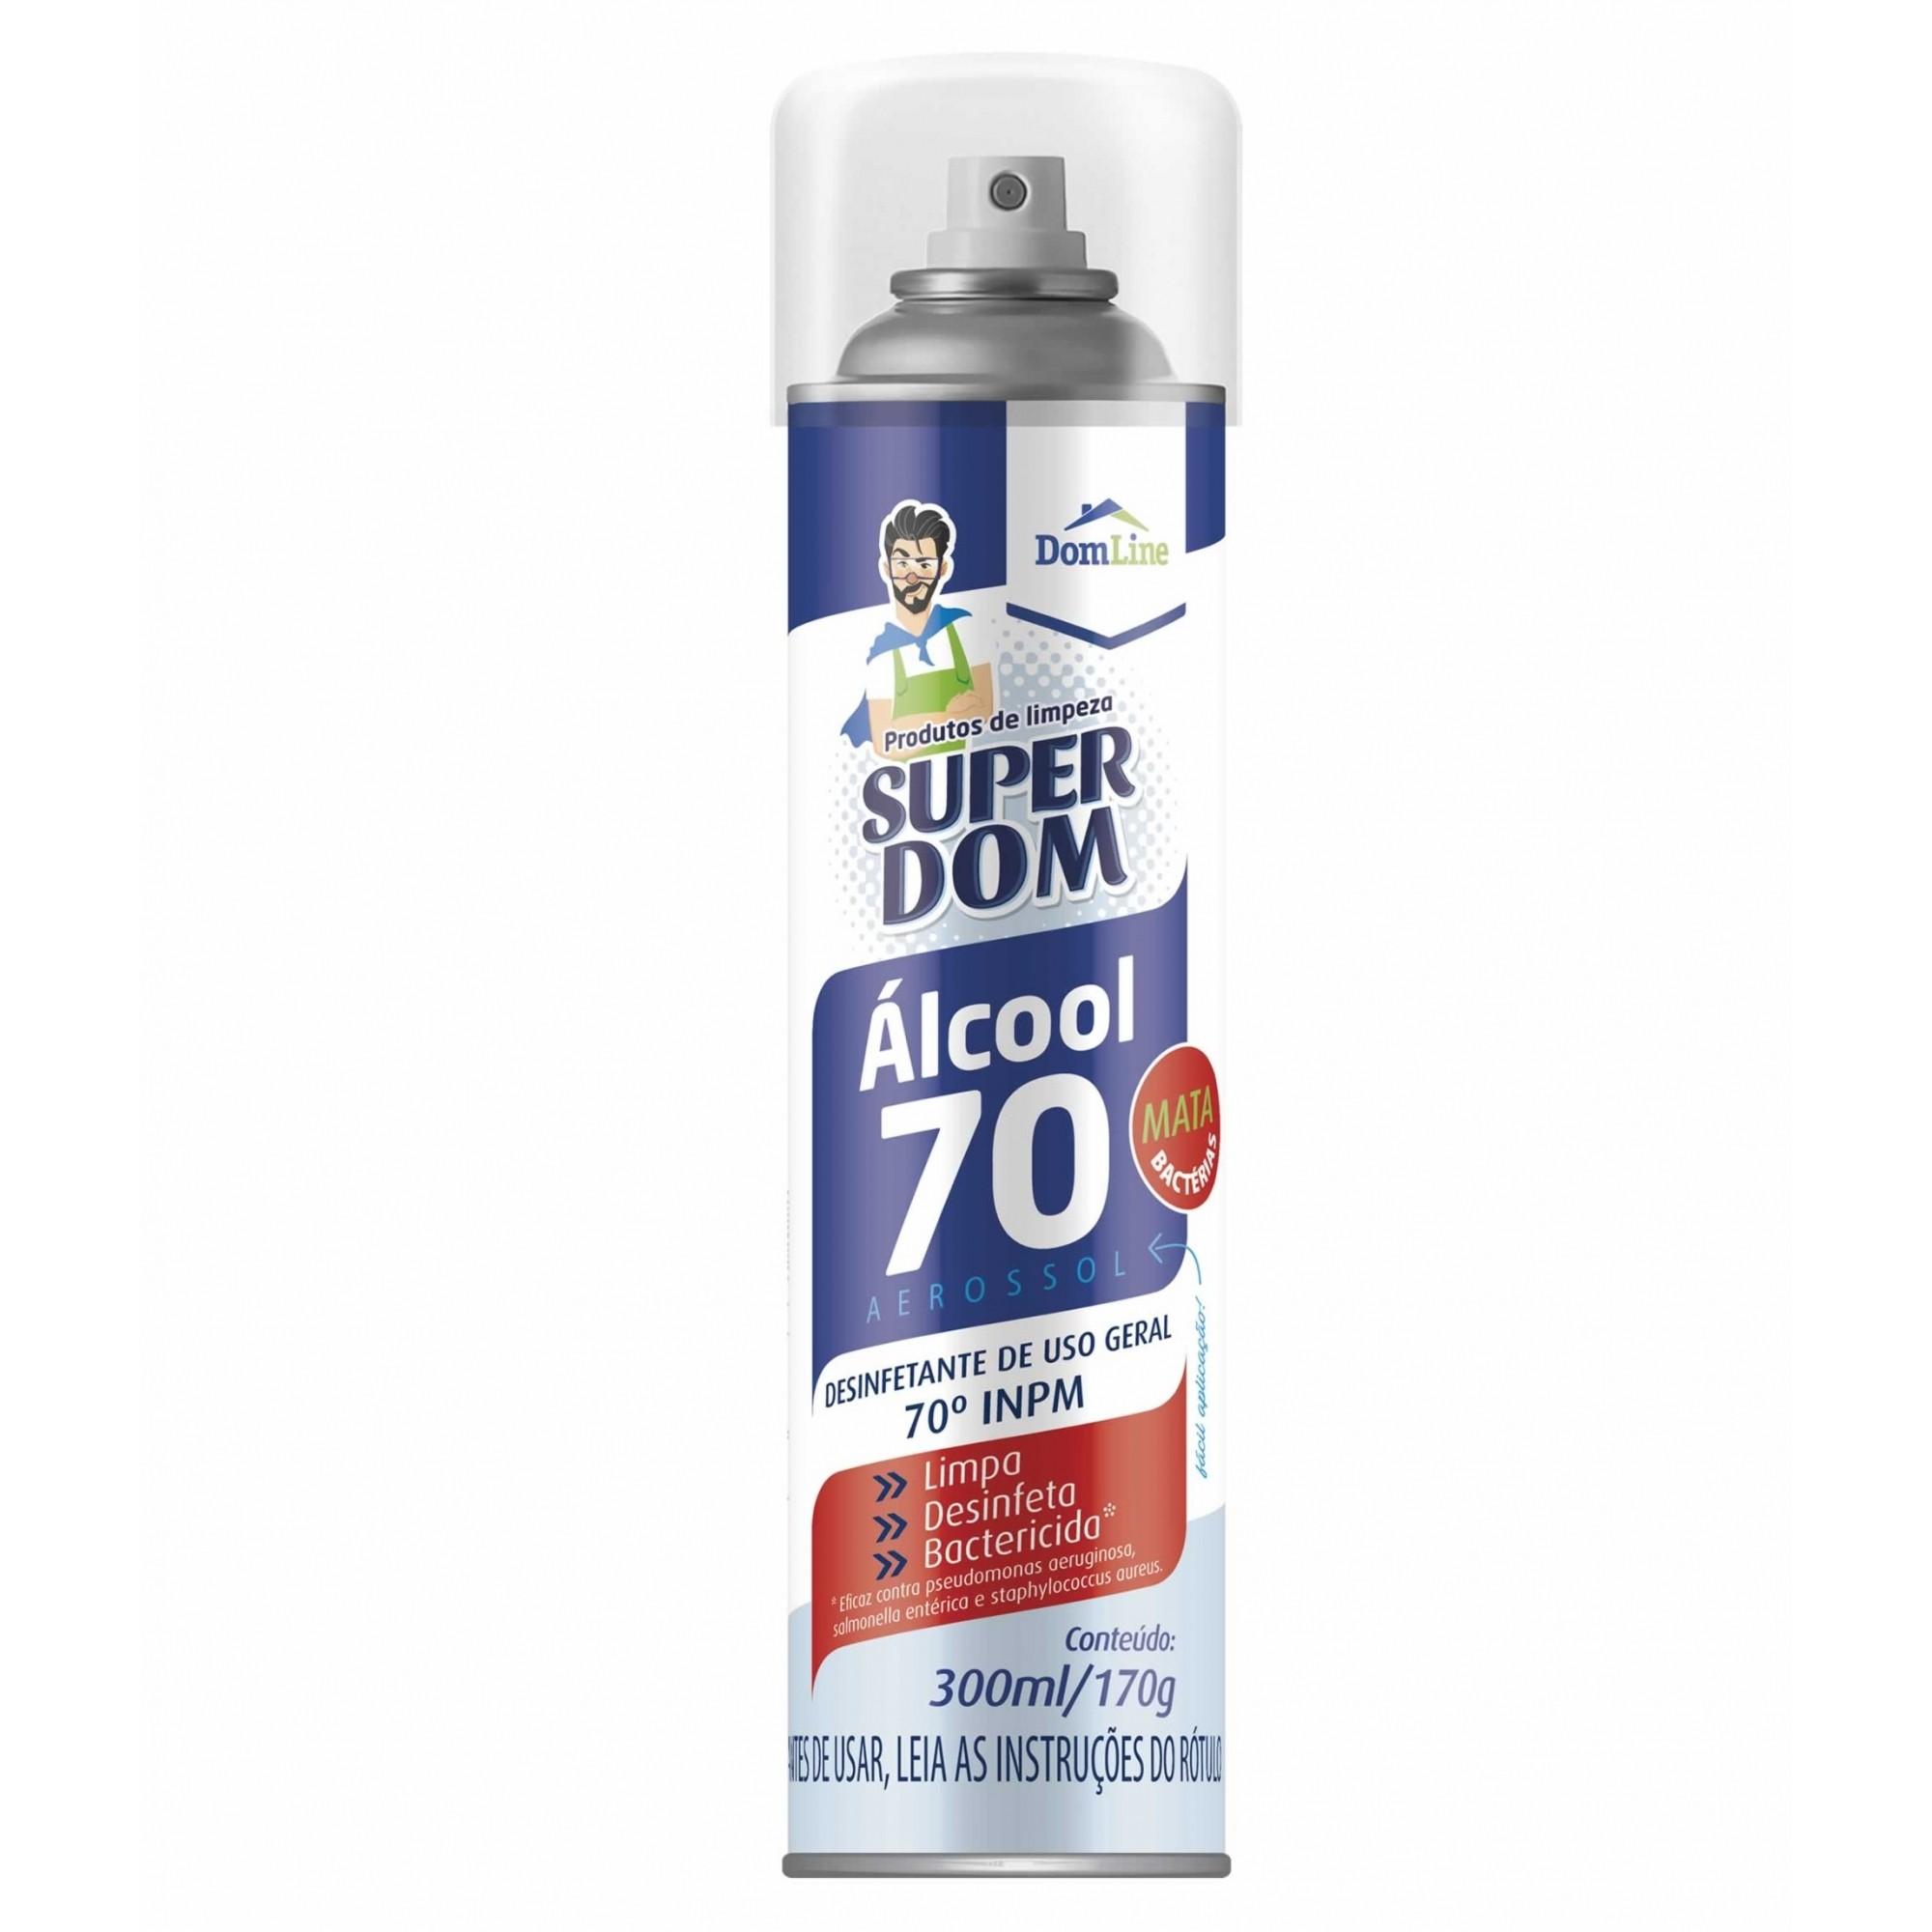 ÁLCOOL 70º SPRAY AEROSSOL 300ML - DESINFETANTE BACTERICIDA